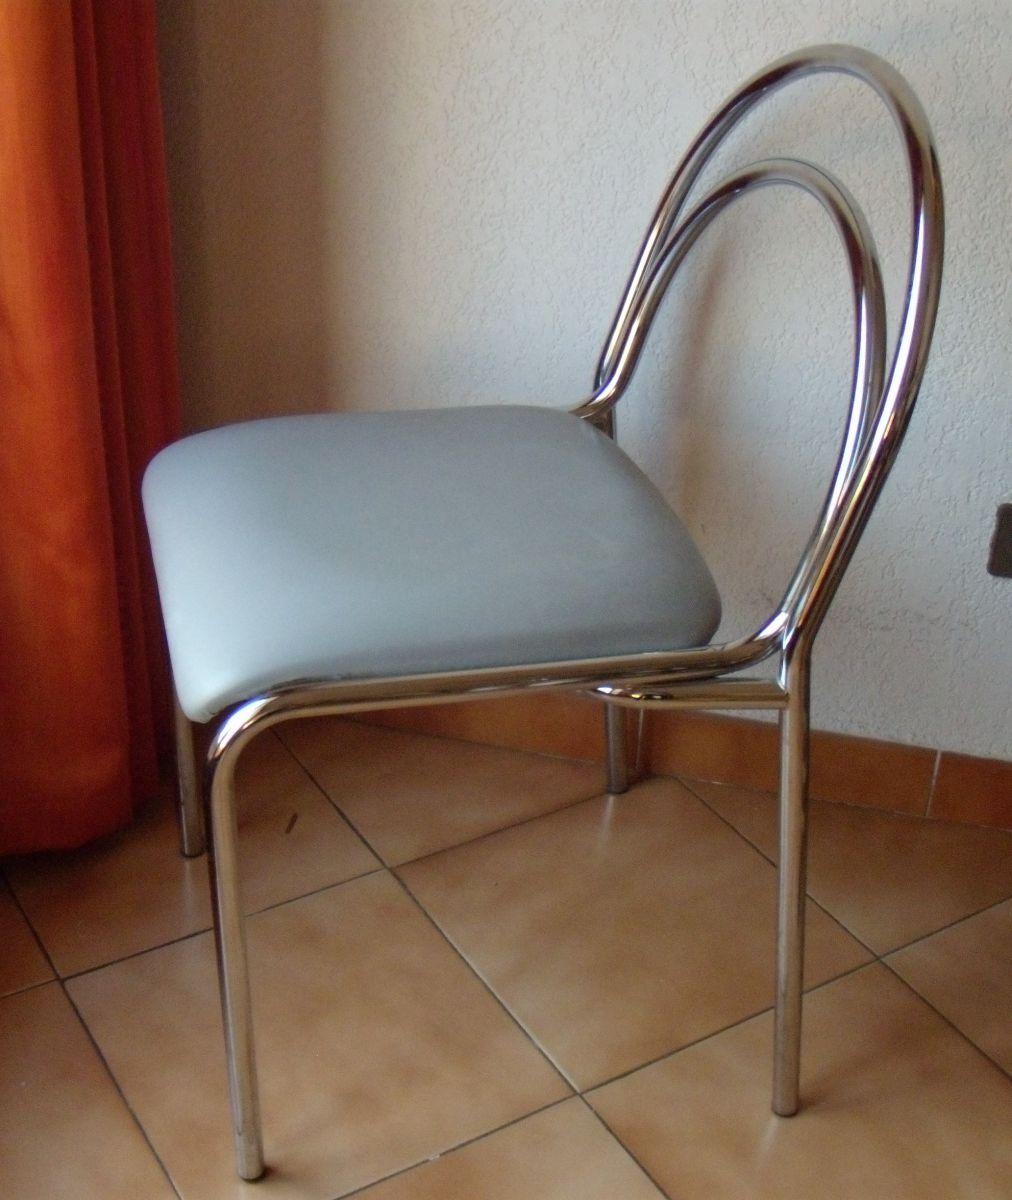 chaise chrome ska 70s luckyfind. Black Bedroom Furniture Sets. Home Design Ideas